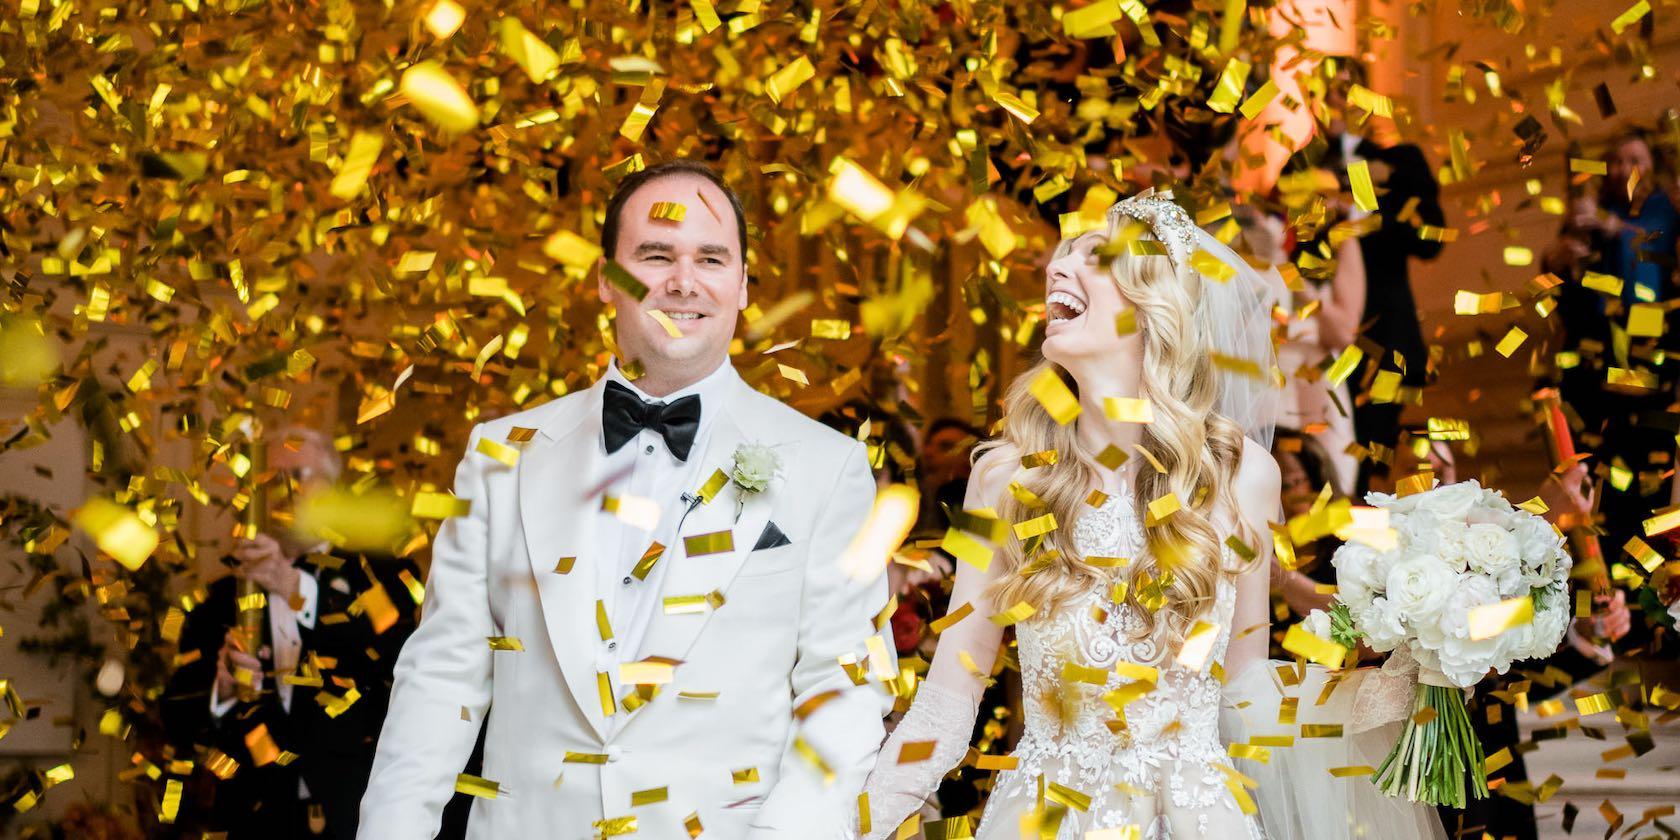 Wedding planner Paris Fête in France